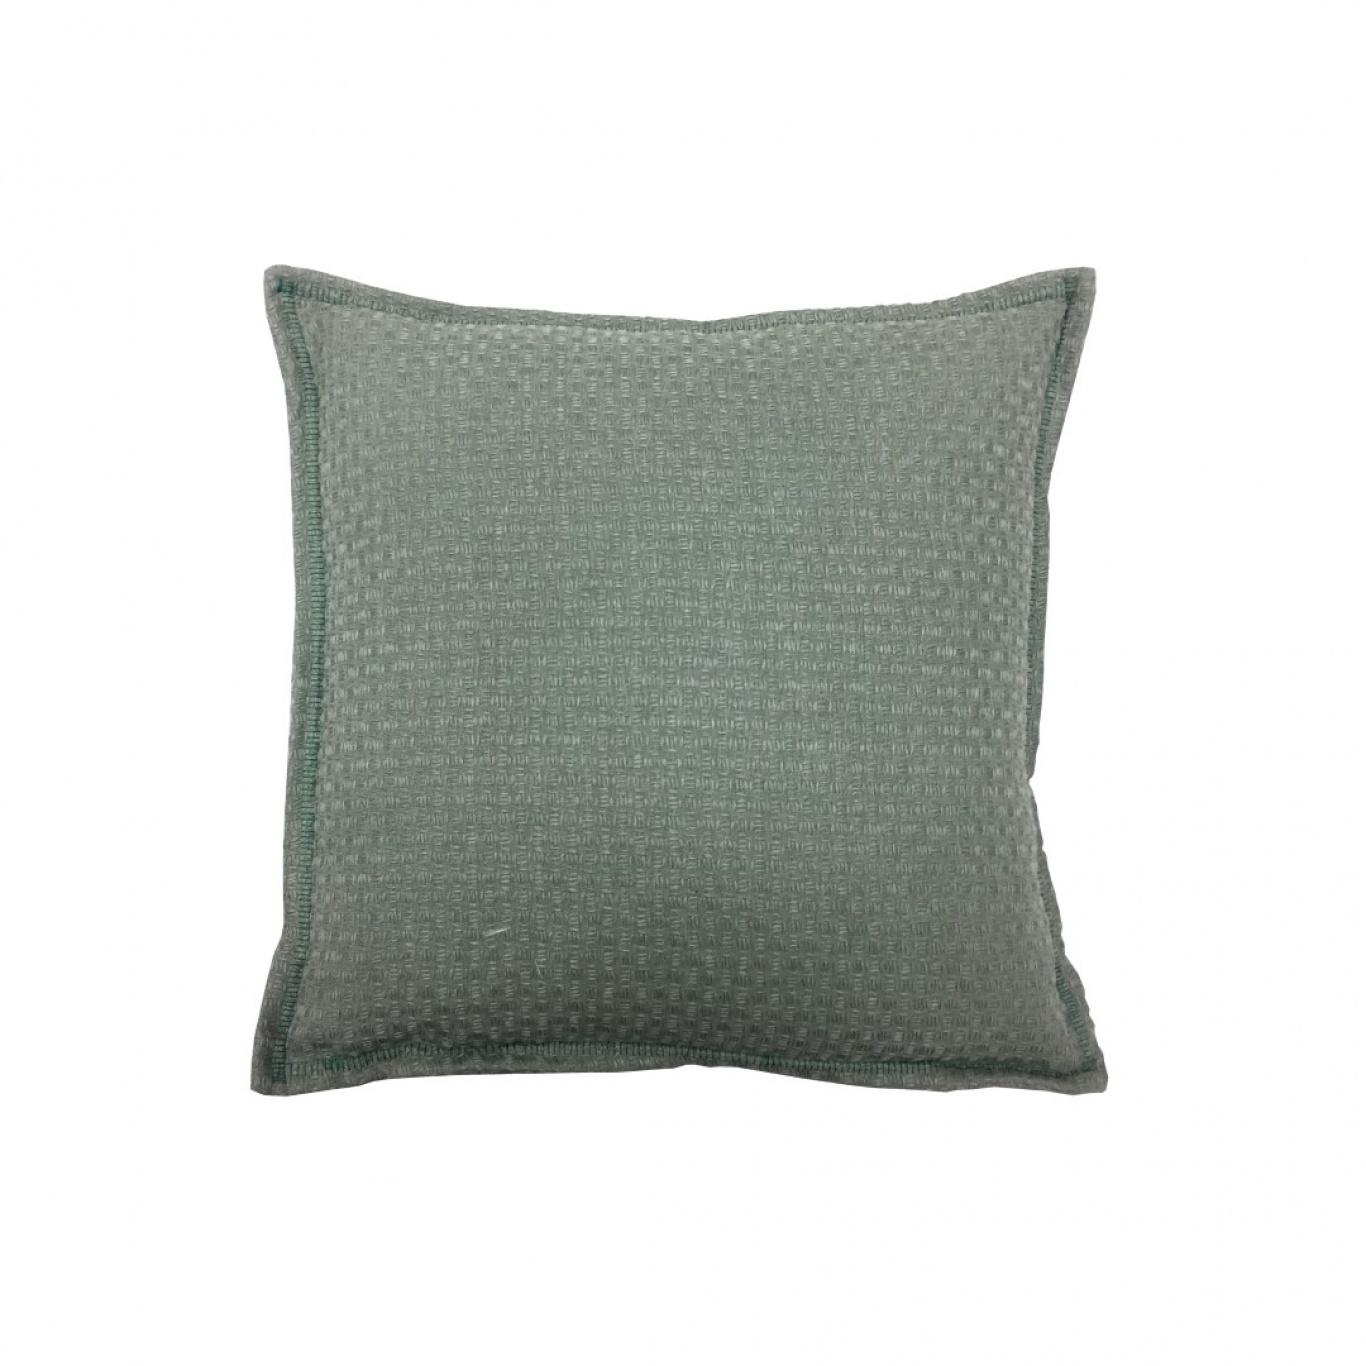 Image of Voyage Nessa Duck Egg Cushion